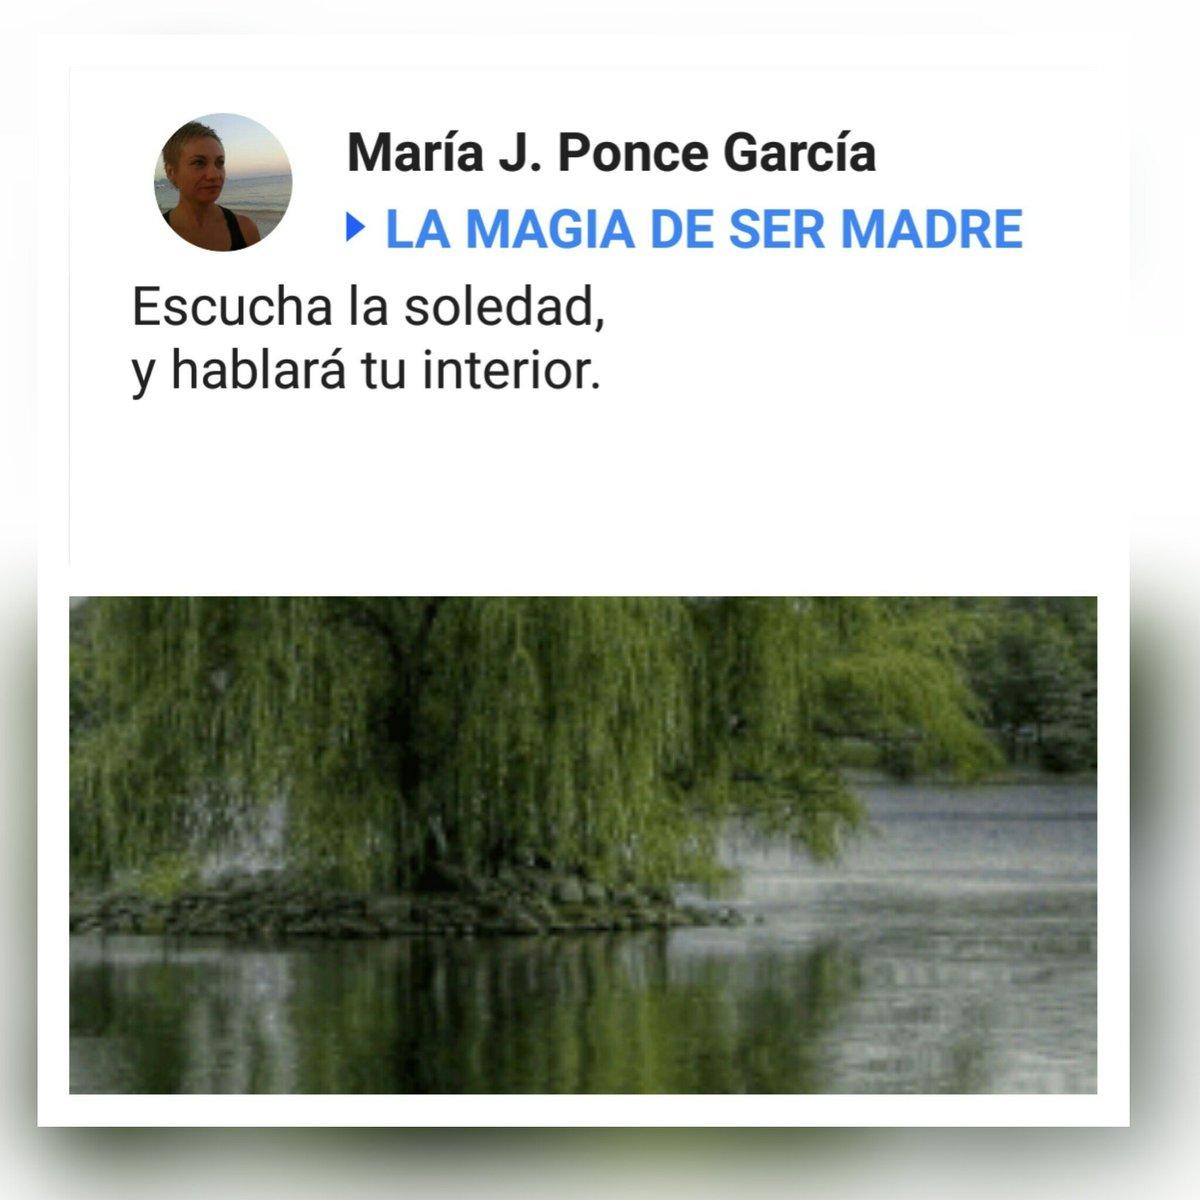 RT @mjpg69: #Soledad https://t.co/pxOSYgK0Y8